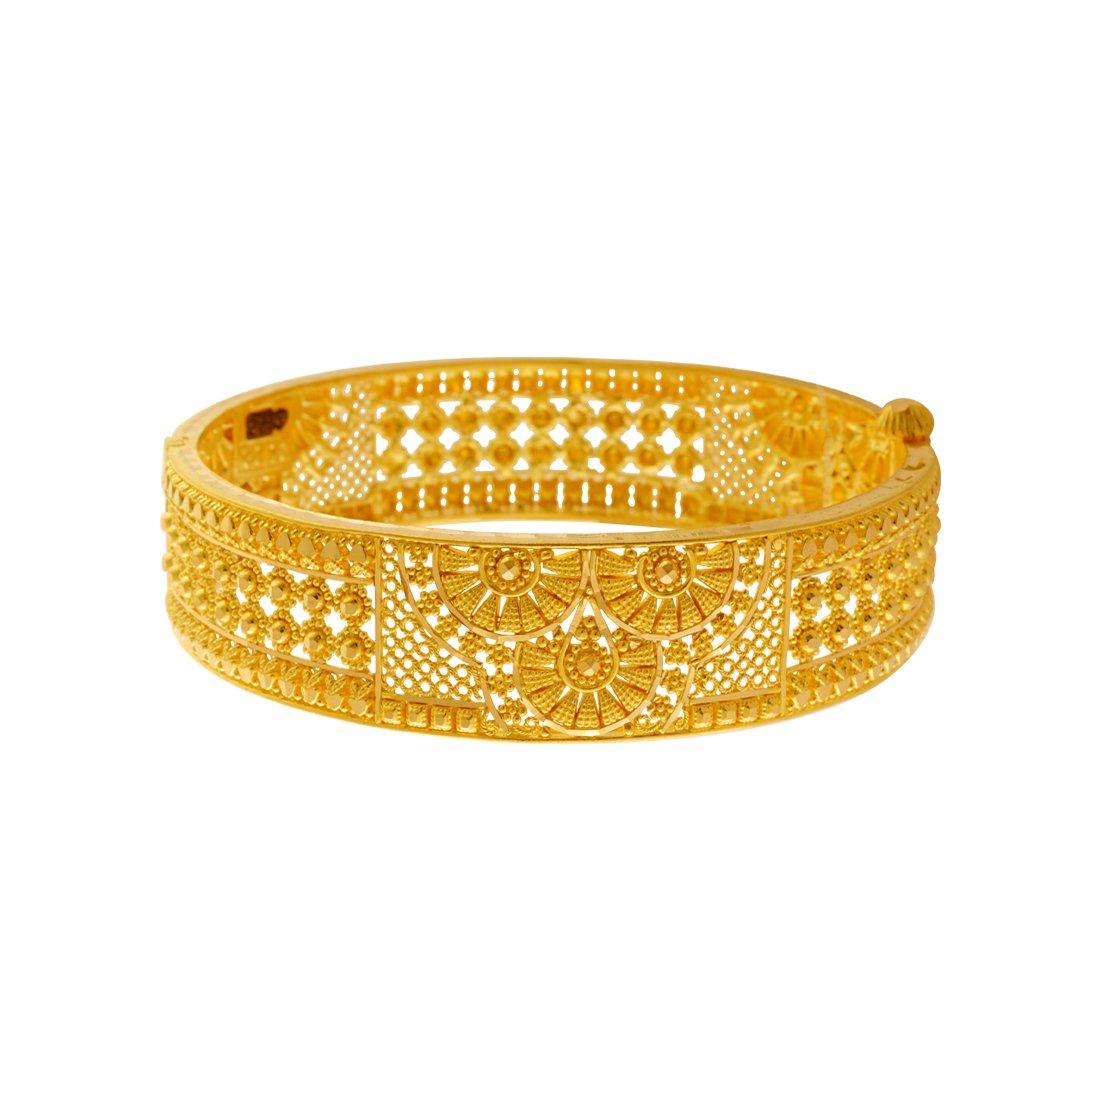 4bb866e5cb0b9 P.C. Chandra Jewellers 22KT Yellow Gold Bangle for Women